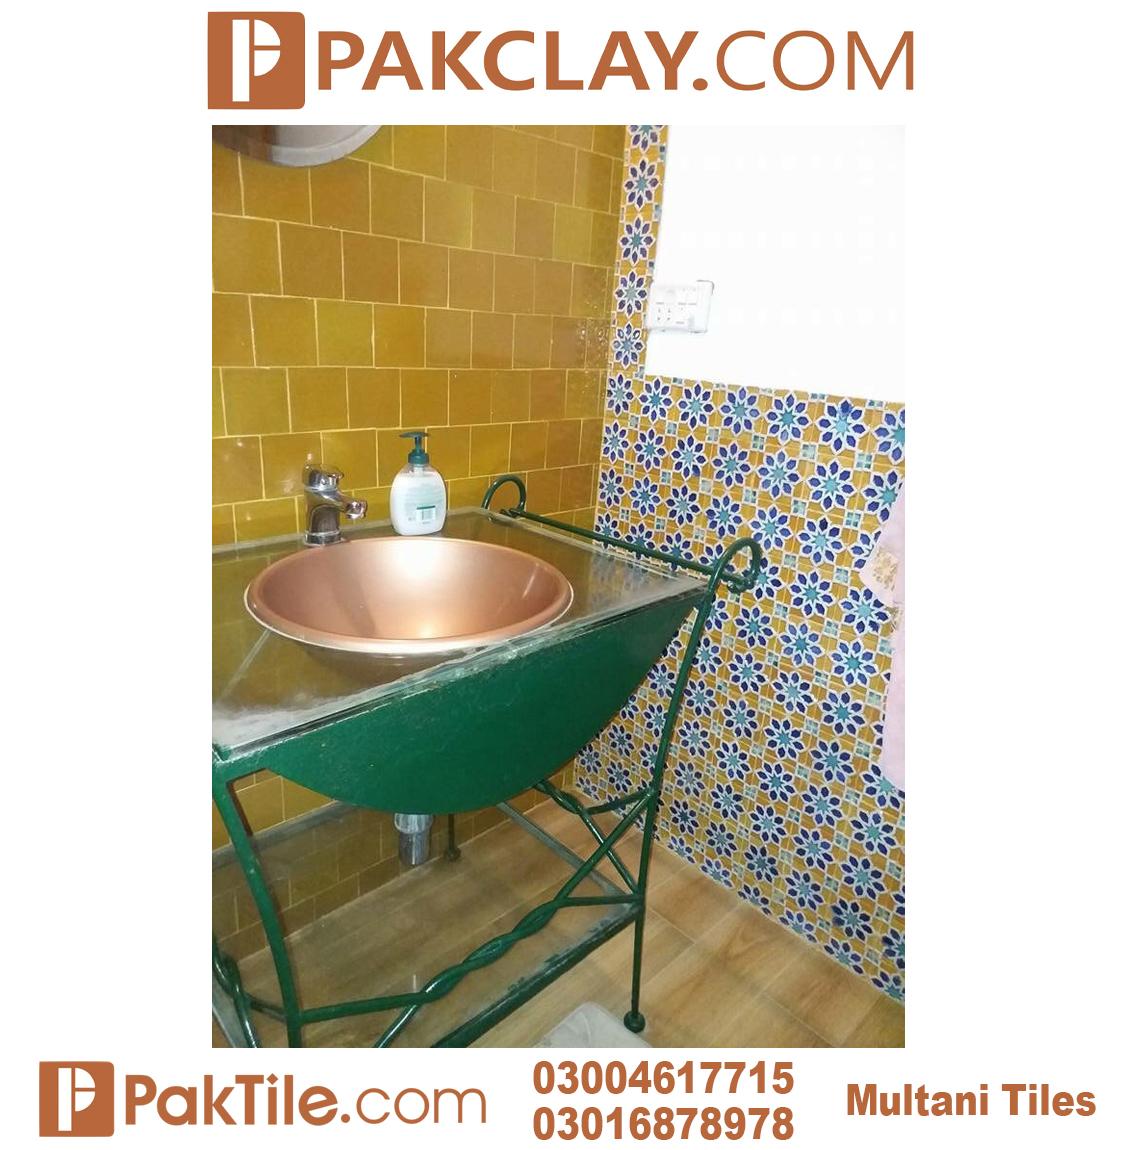 Pak Clay Handmade Tiles Pakistan Ceramic Mosaic Wall Tiles